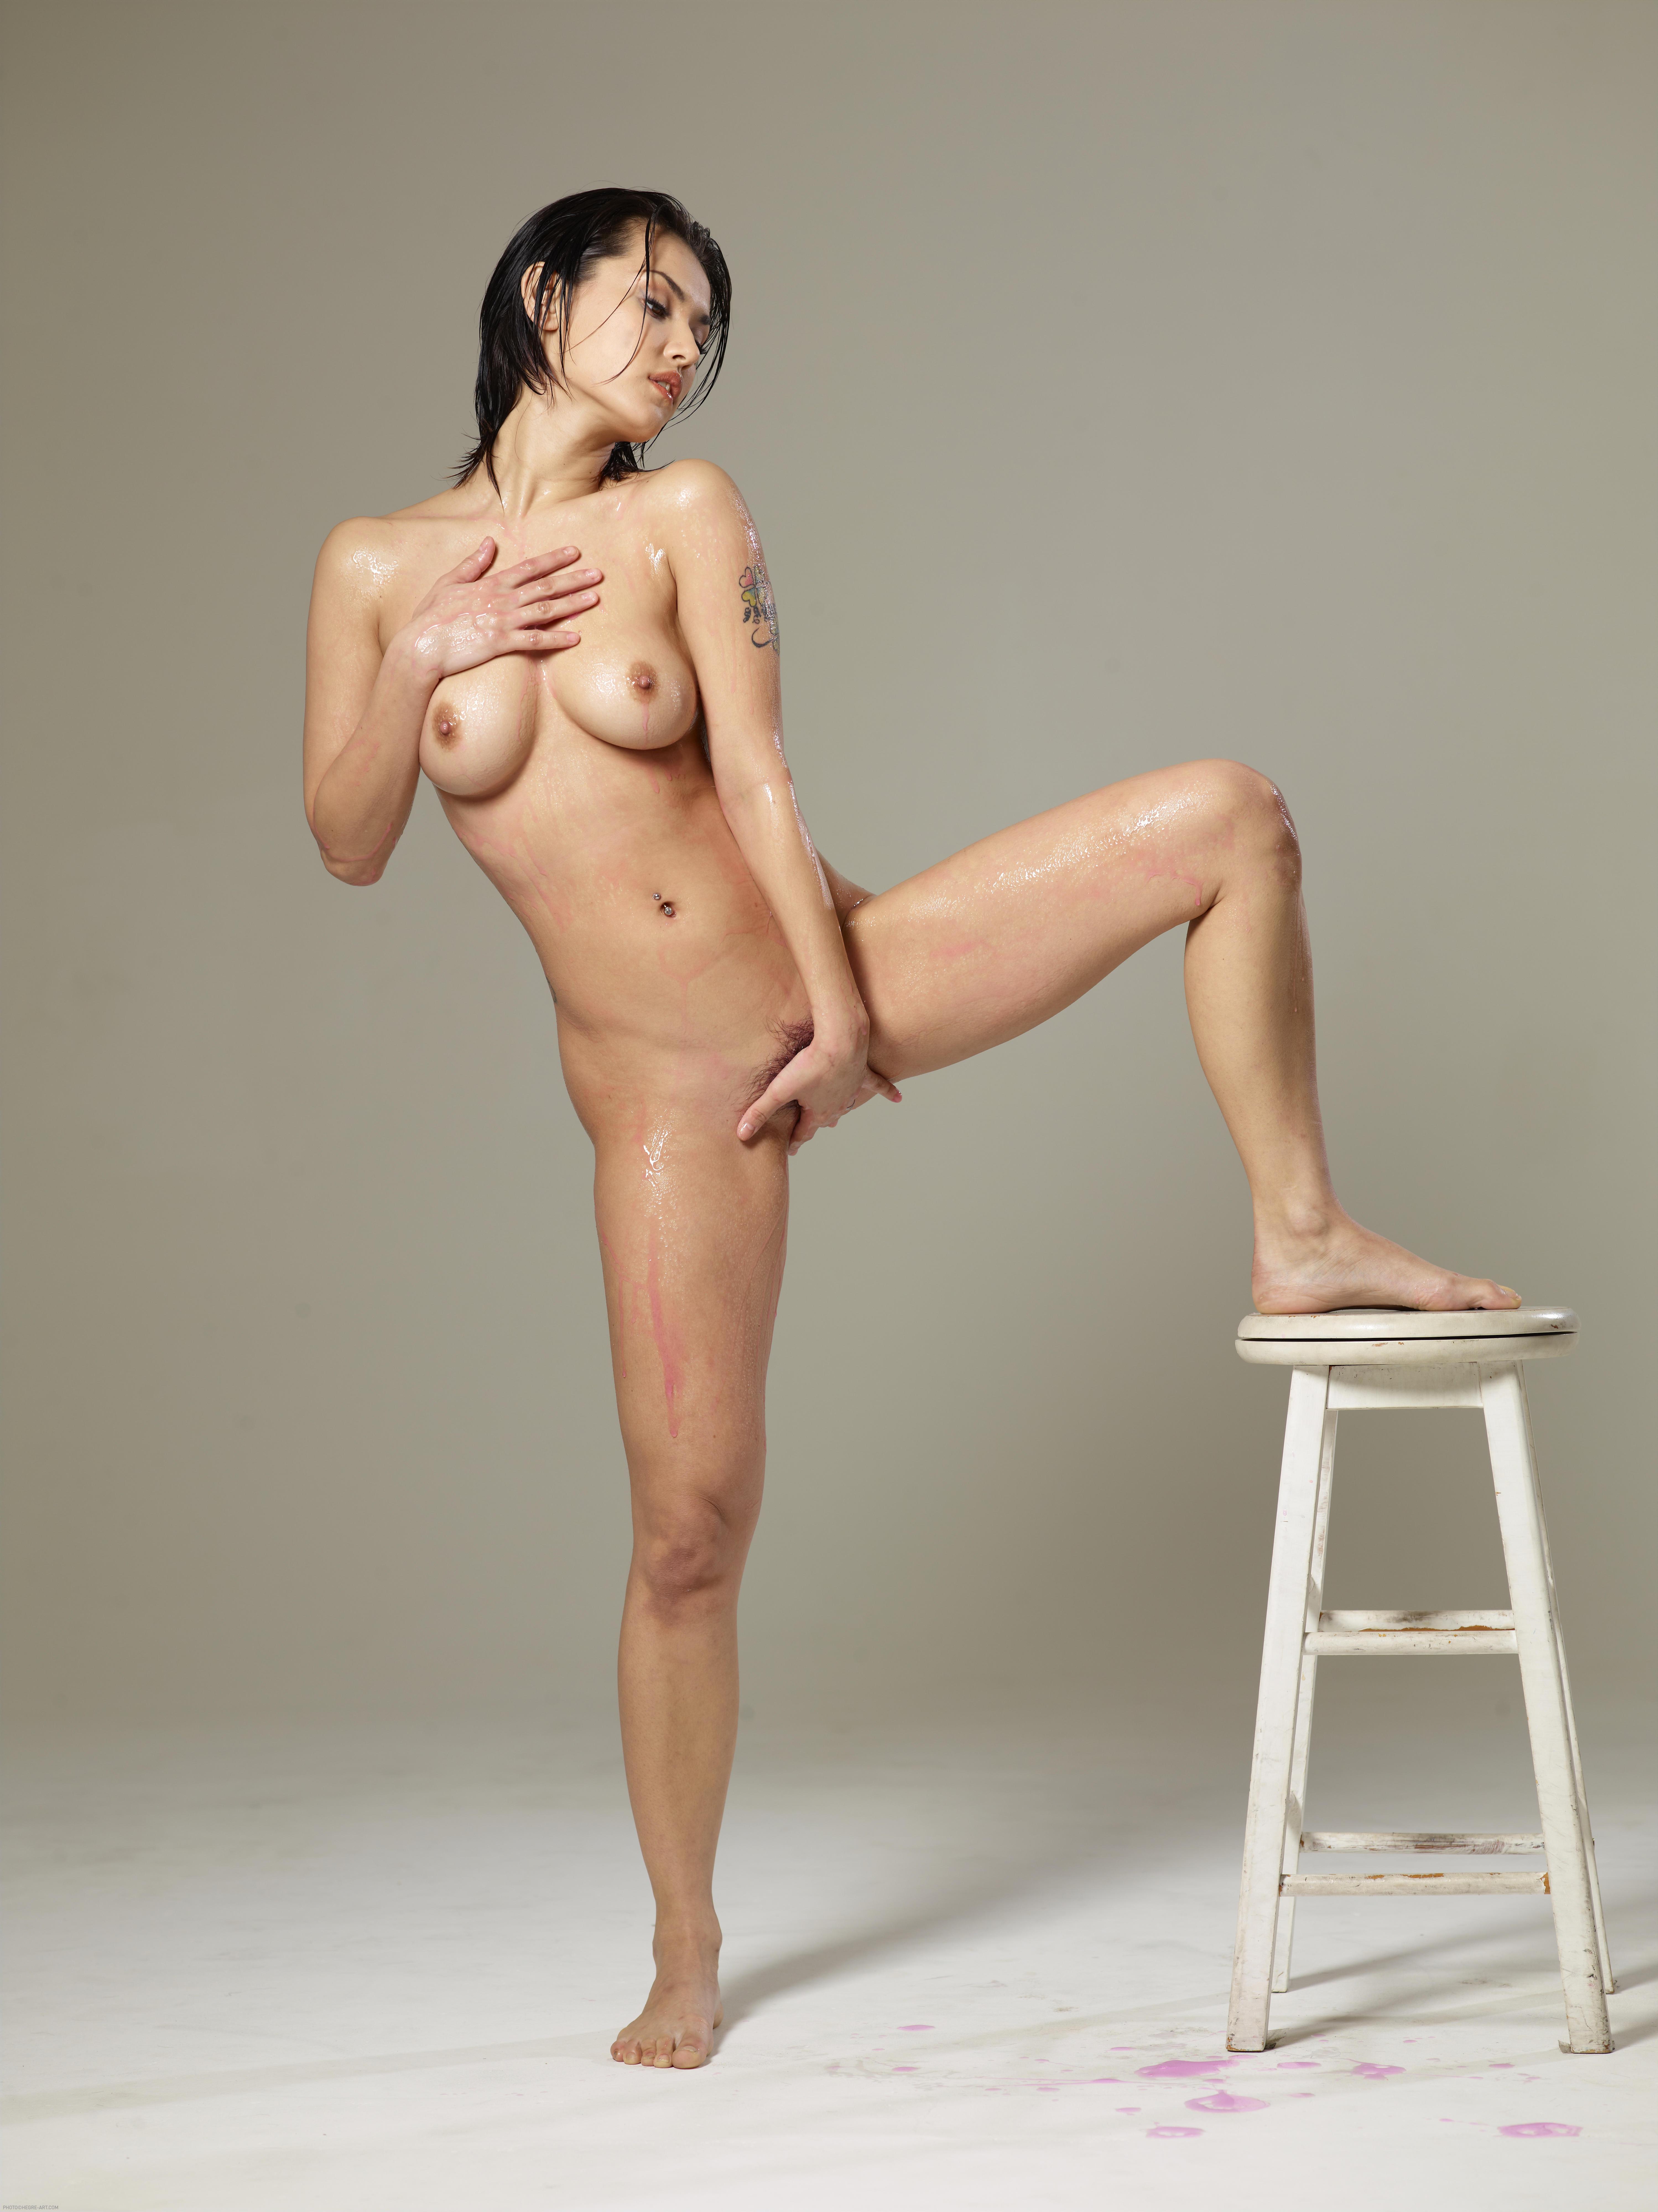 marias massage gratis porrfimer